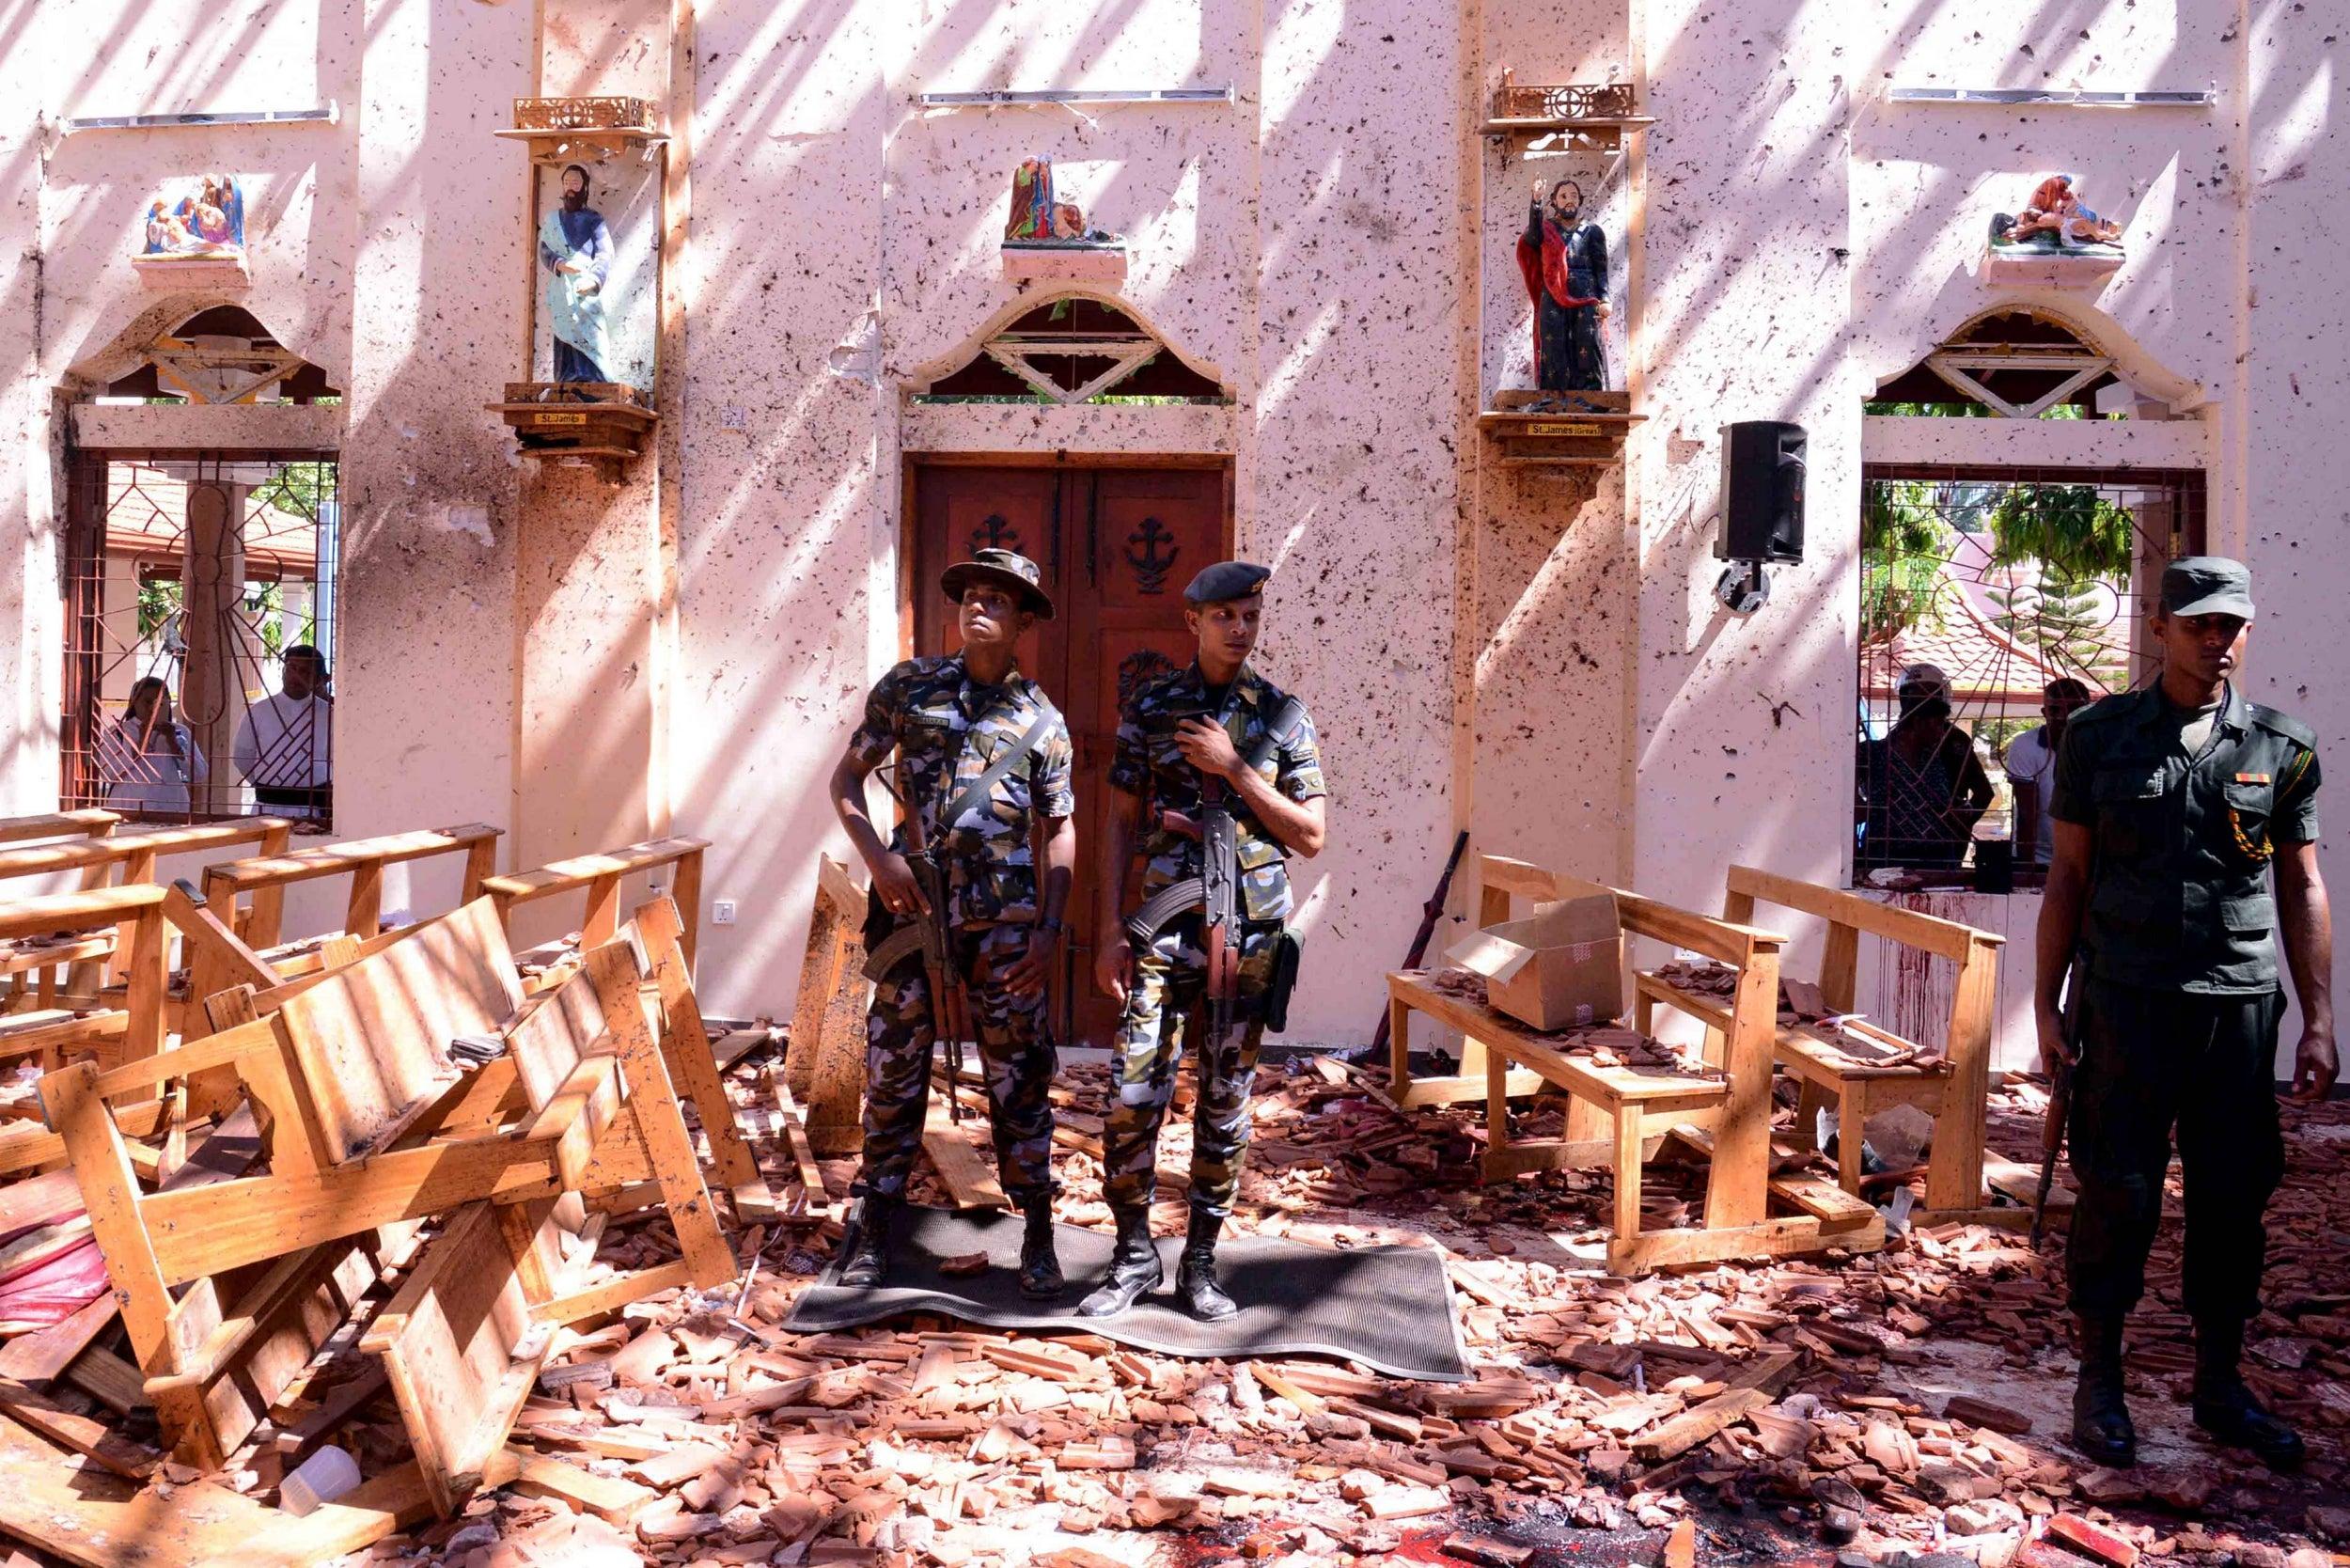 Sri Lanka blast news - LIVE: Bomb attacks leave at least 200